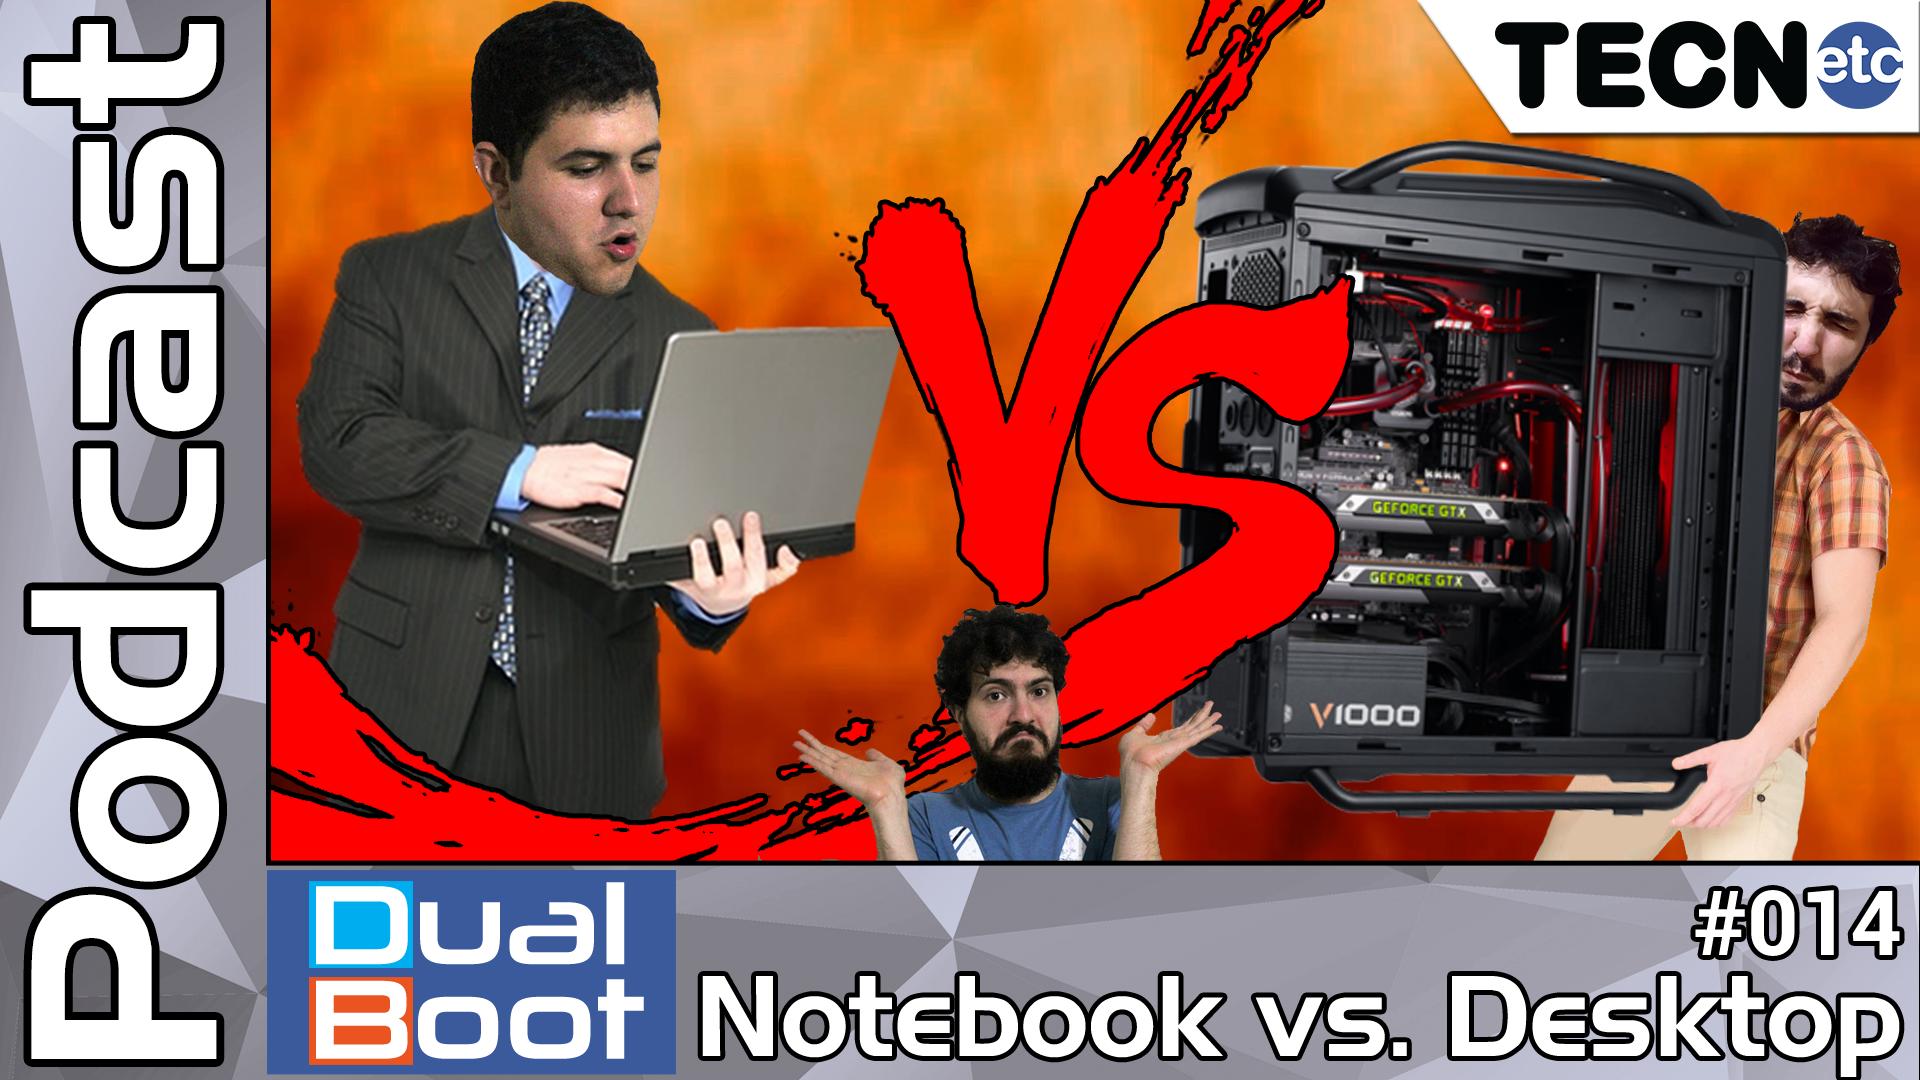 Dual Boot #014: Notebook vs. Desktop – Podcast